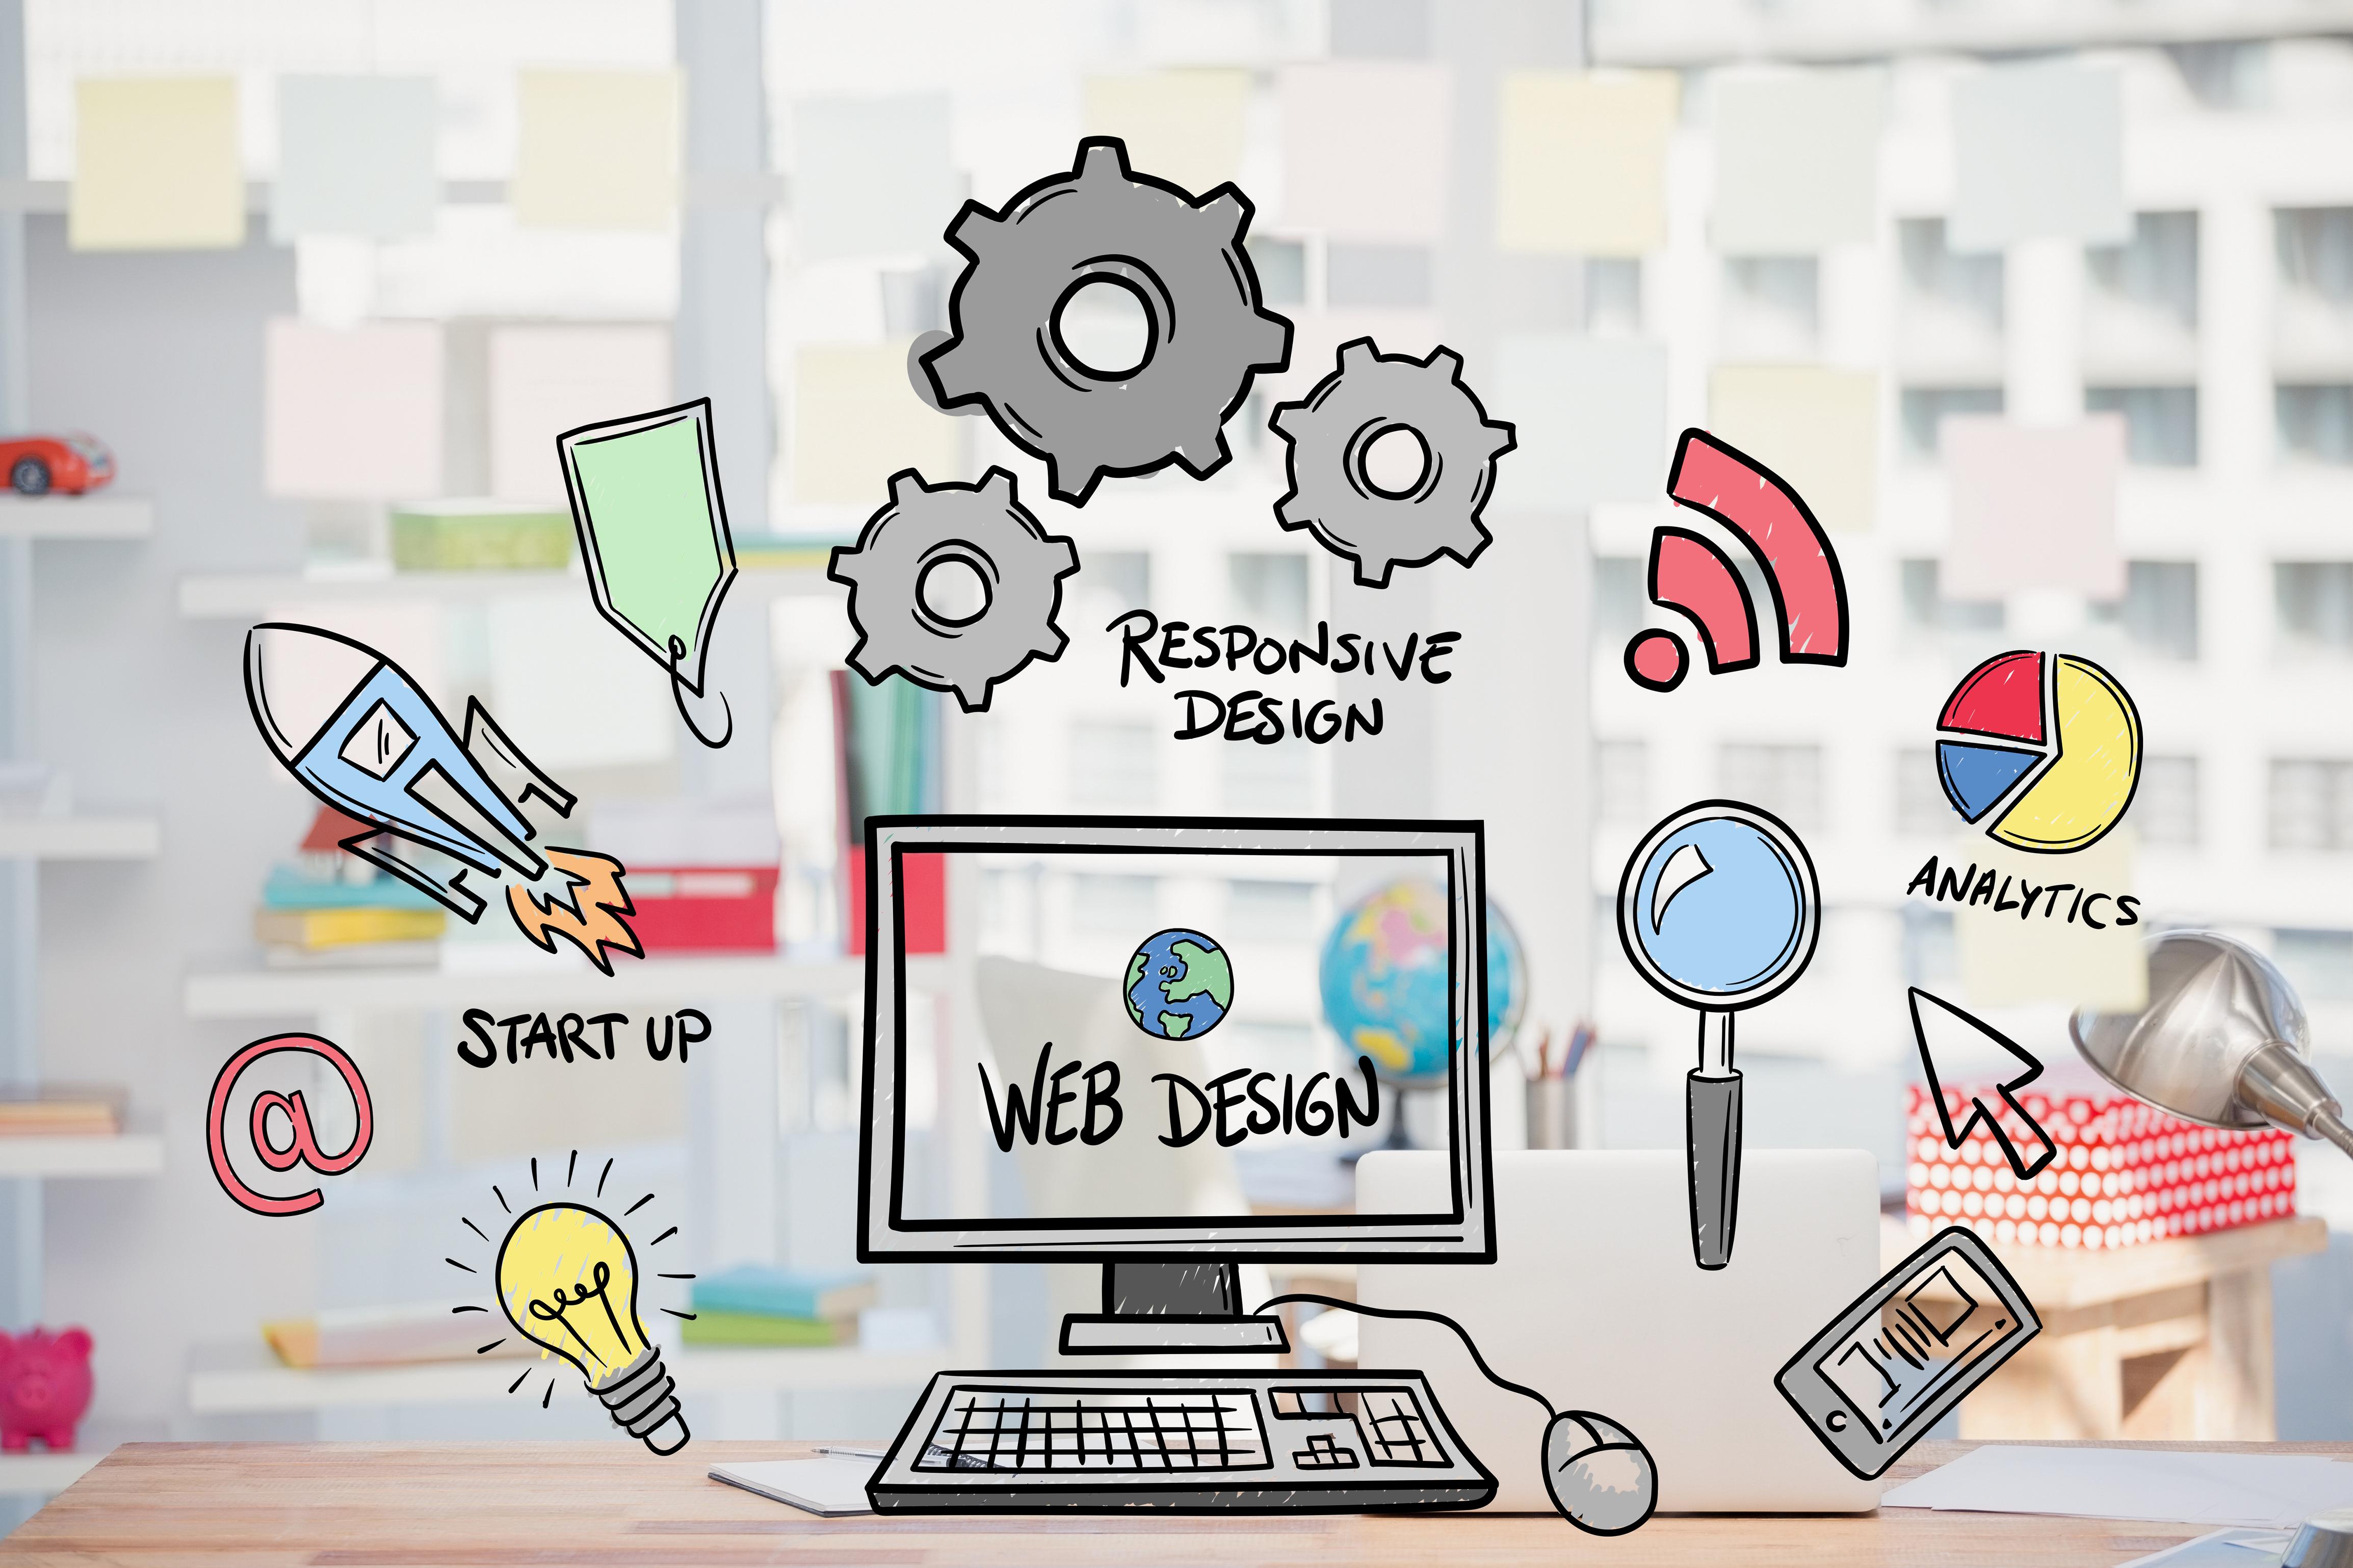 Web Design Dundee In 2020 Web Design Services Learn Web Development Web Design Company